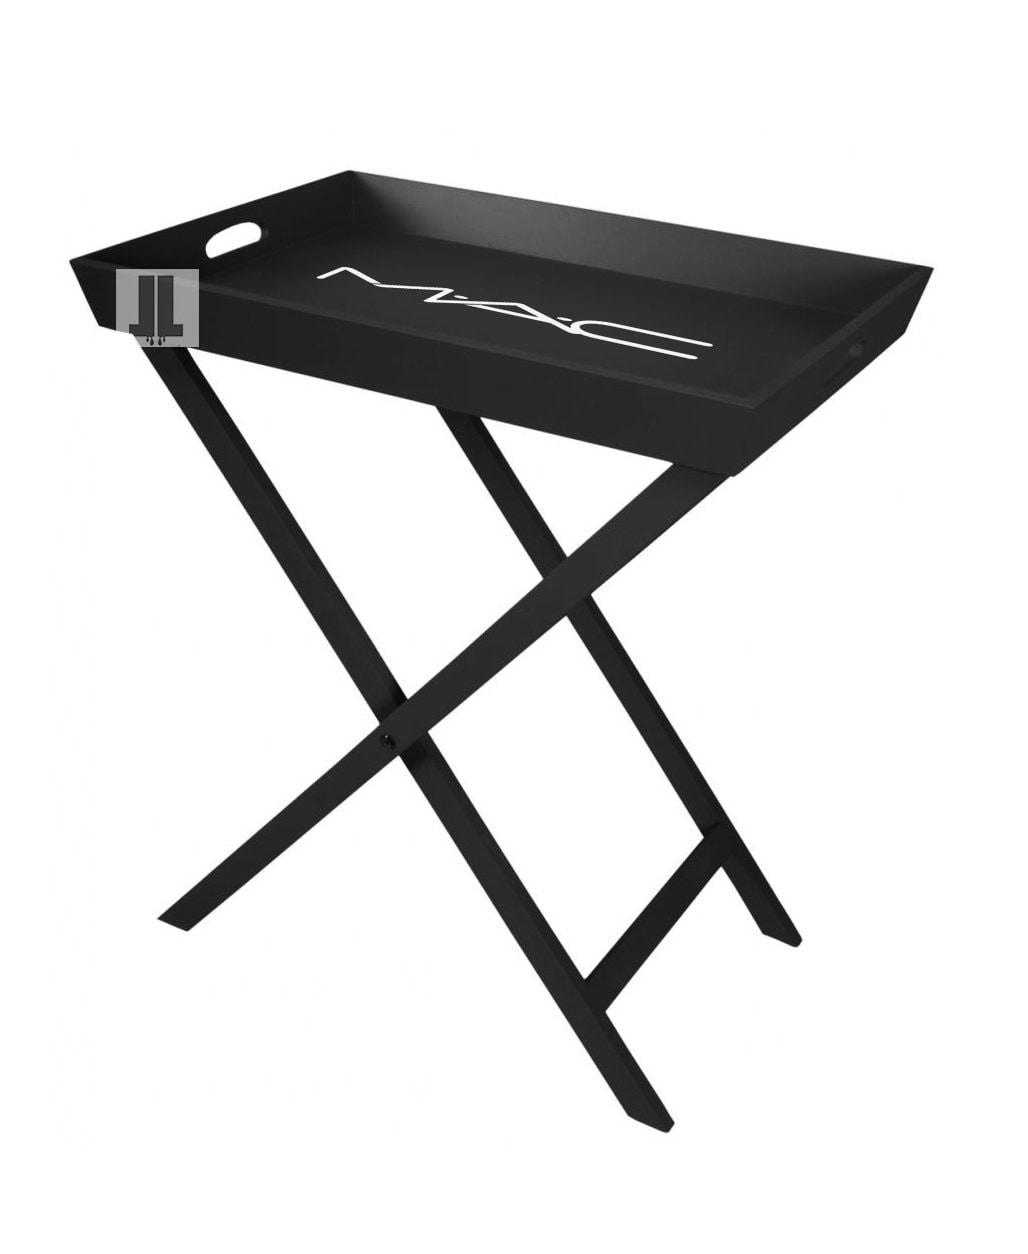 mac make up vanity tray table black foldable 24x16x2